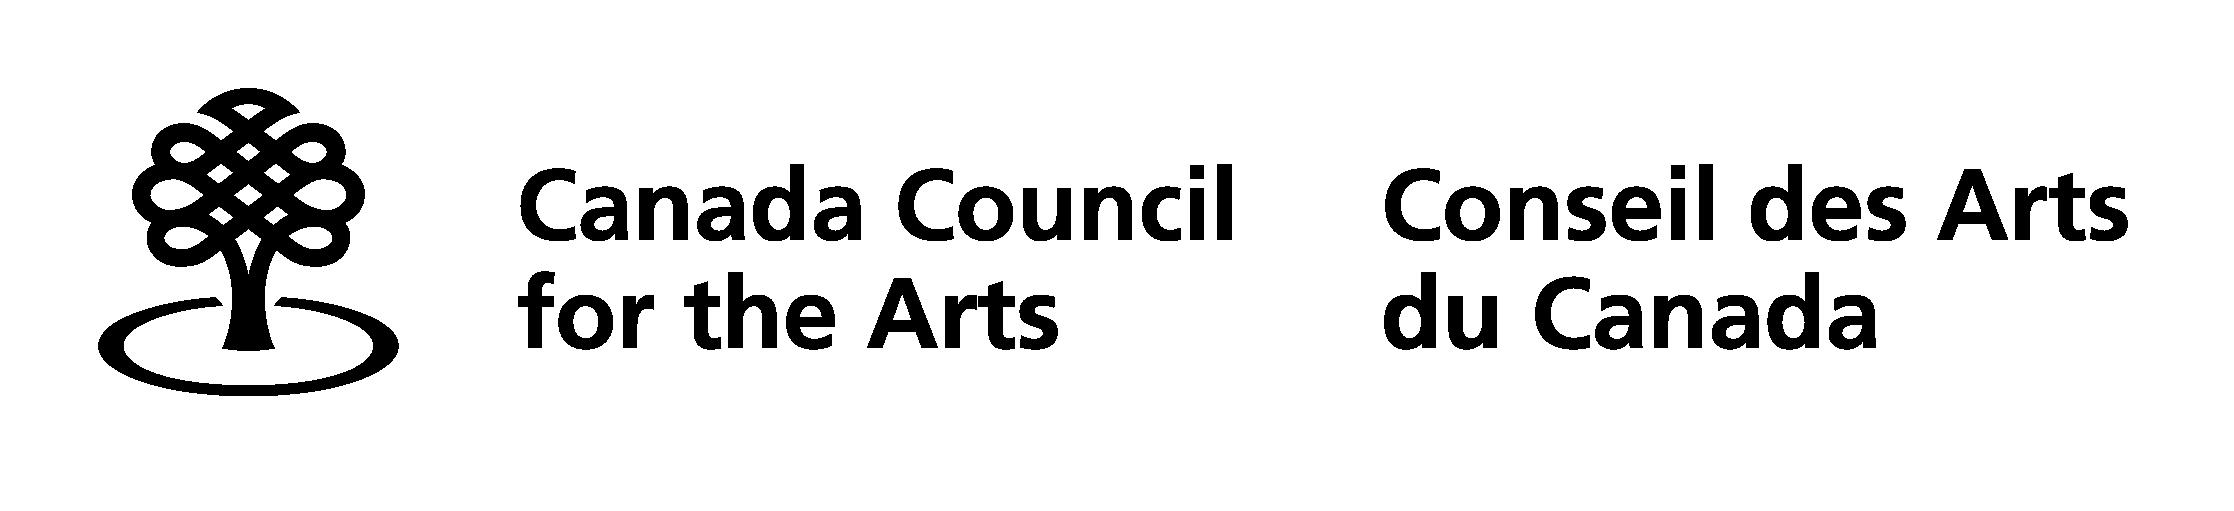 canada-council-logo_e_l.jpg